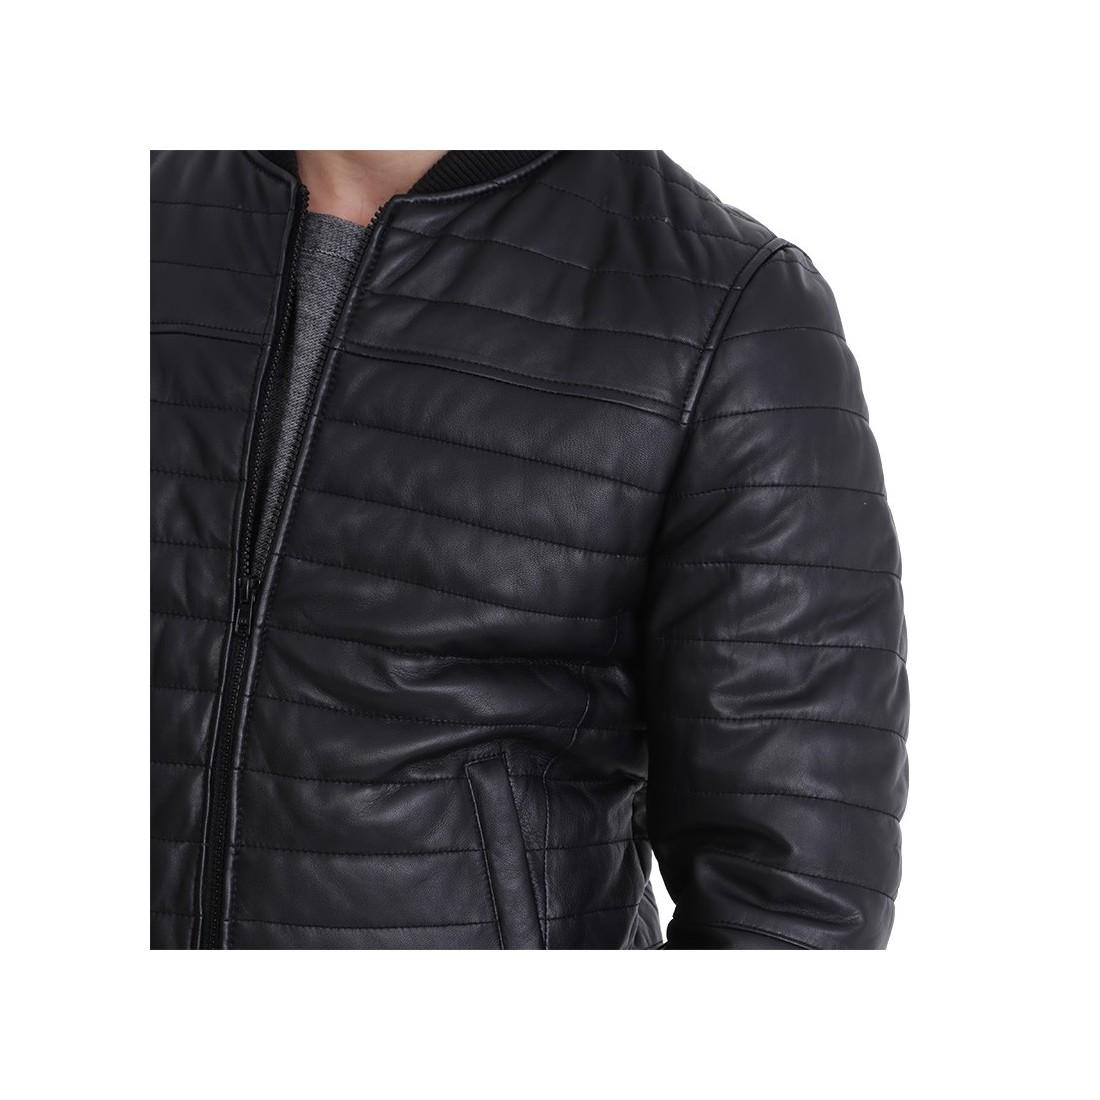 7687c9f94e1 blouson-cuir-homme-oakwood-urban-noir.jpg